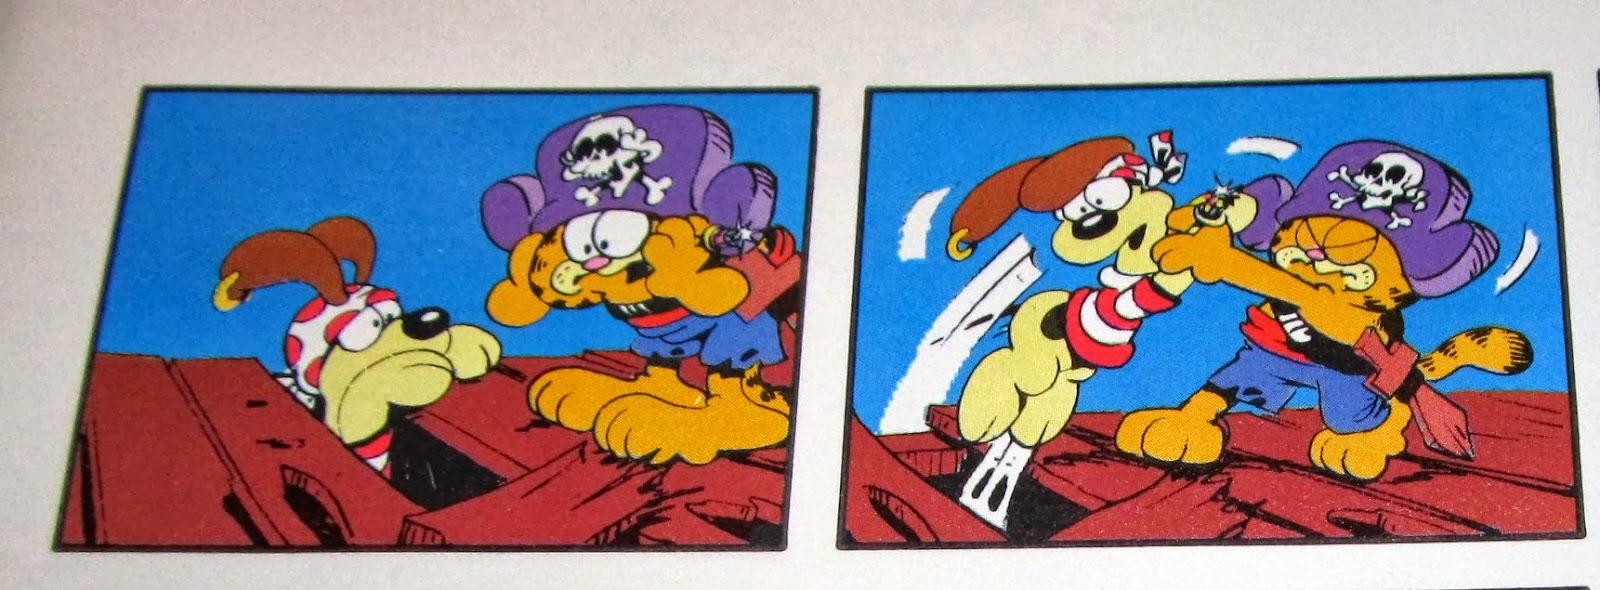 Garfield Halloween Book | Goodwill Hunting 4 Geeks Halloween Countdown Day 19 Garfield In